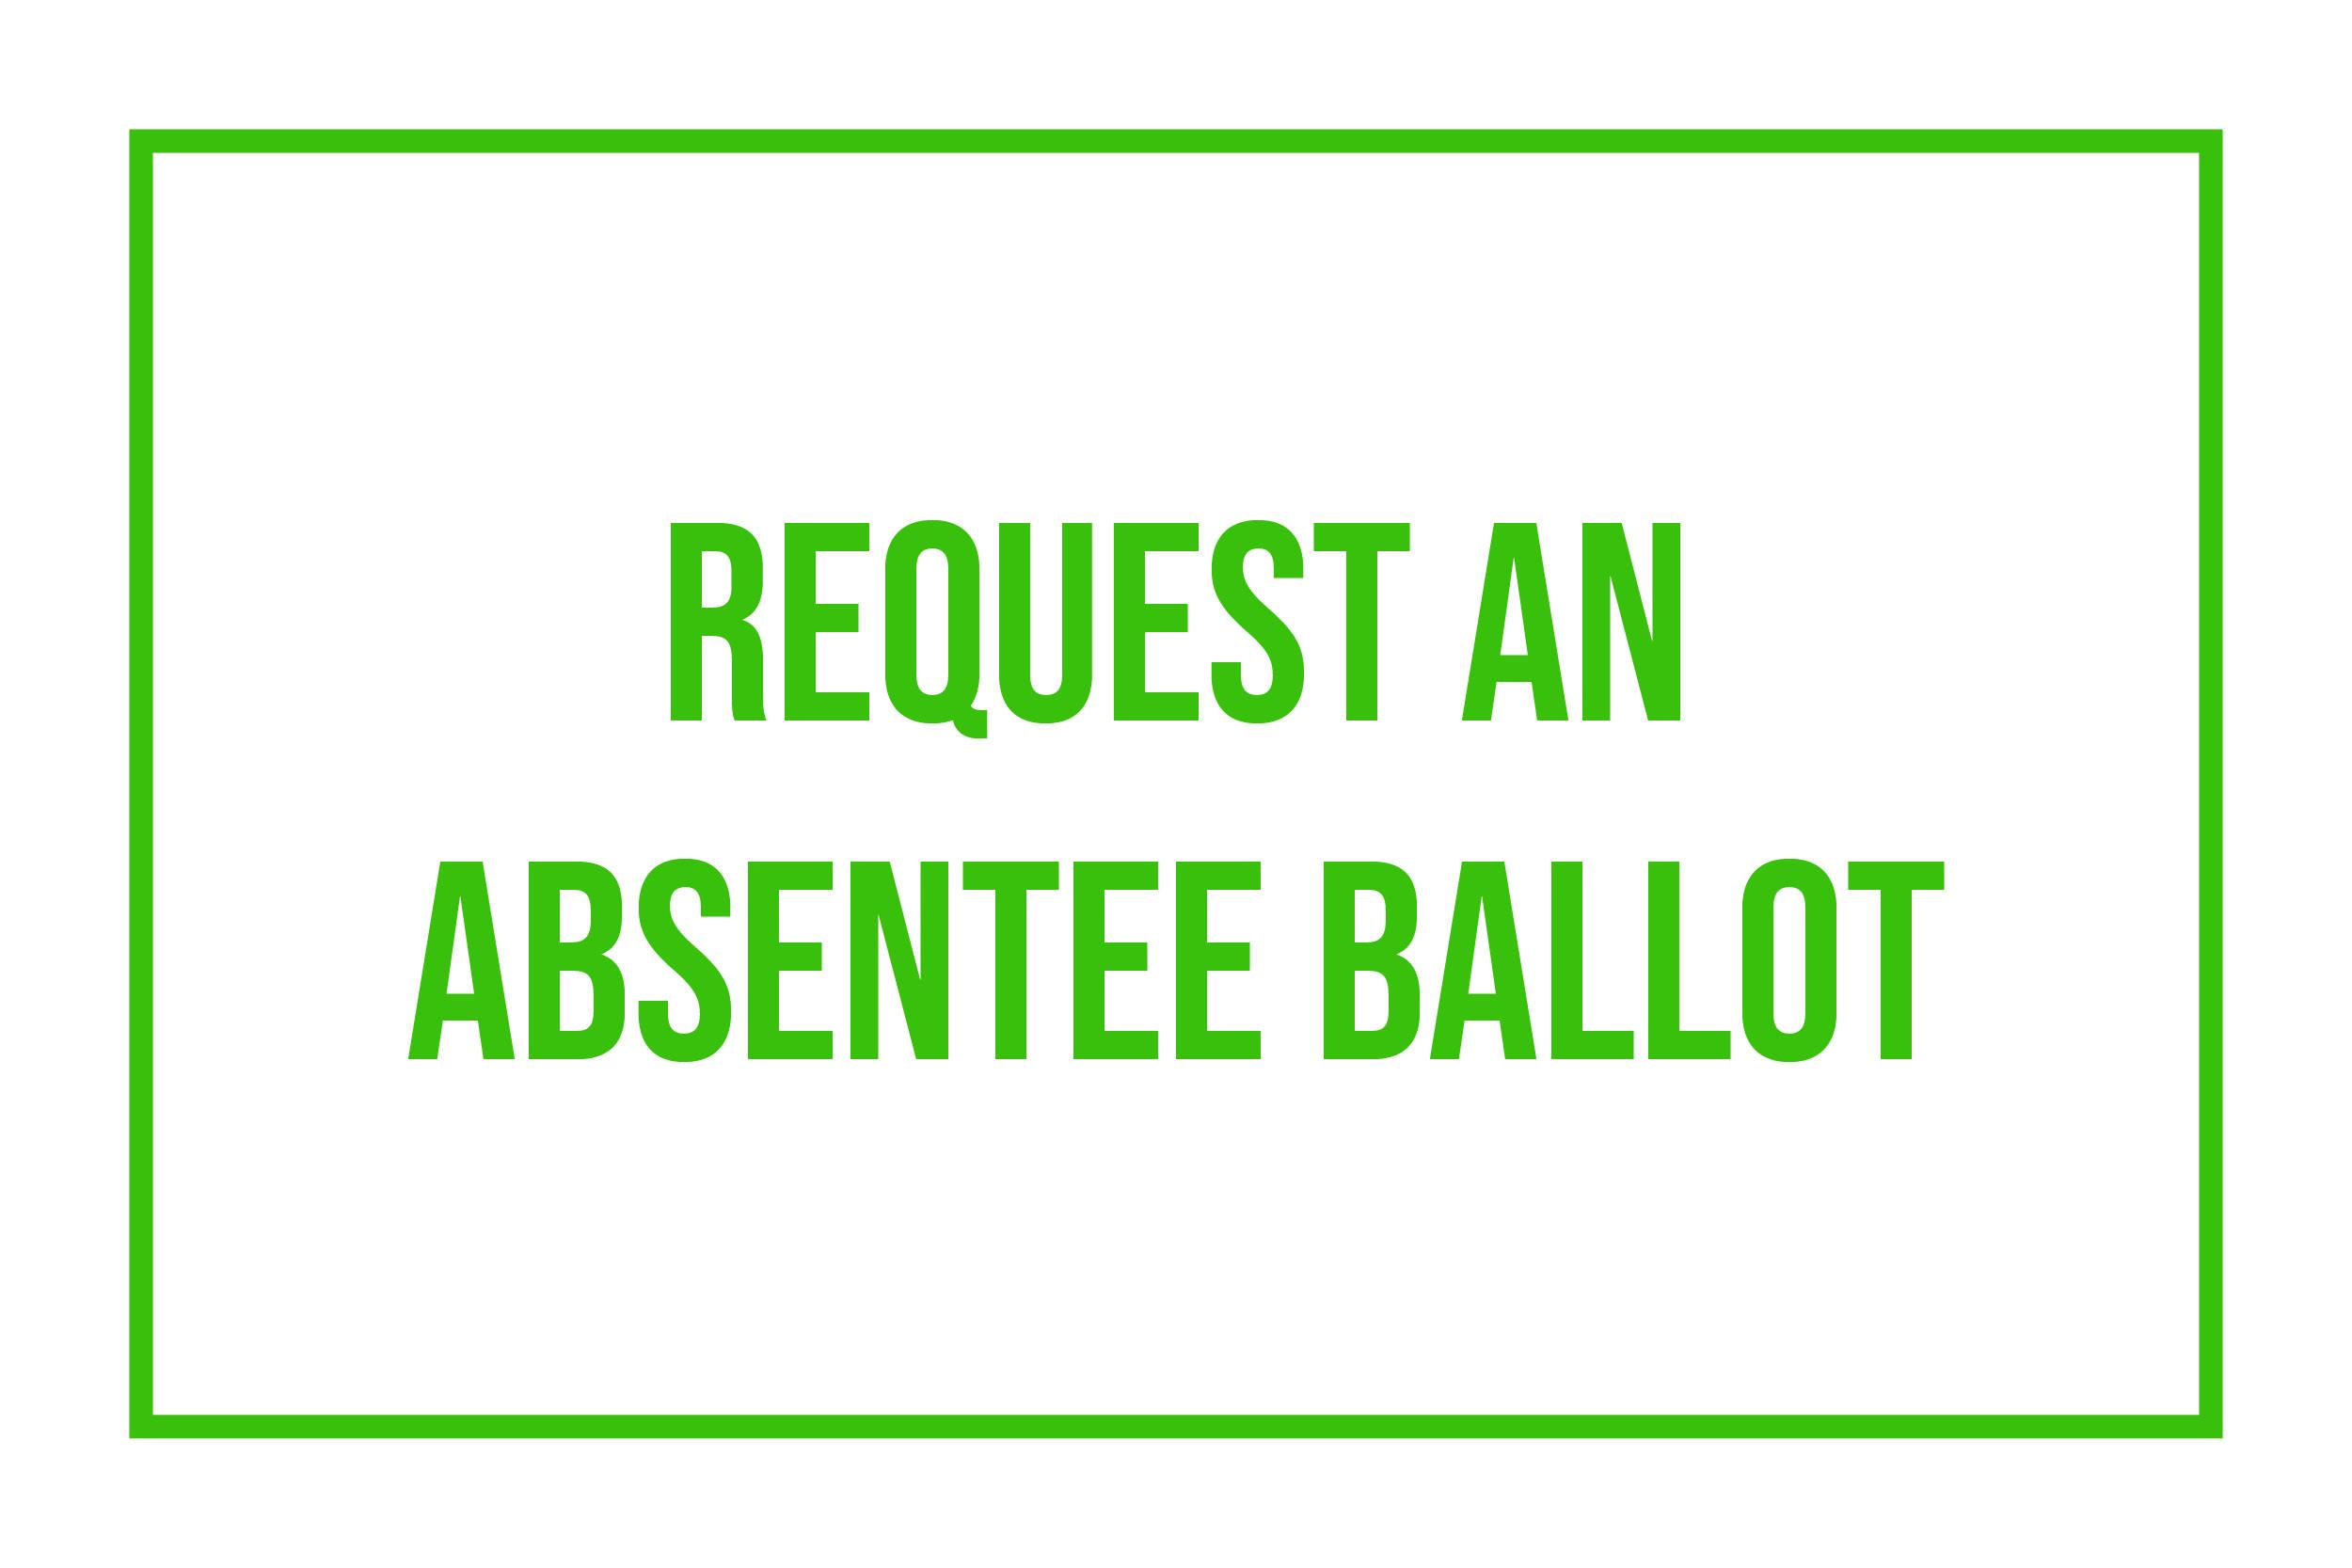 request_an_absentee_ballot_vote_600px